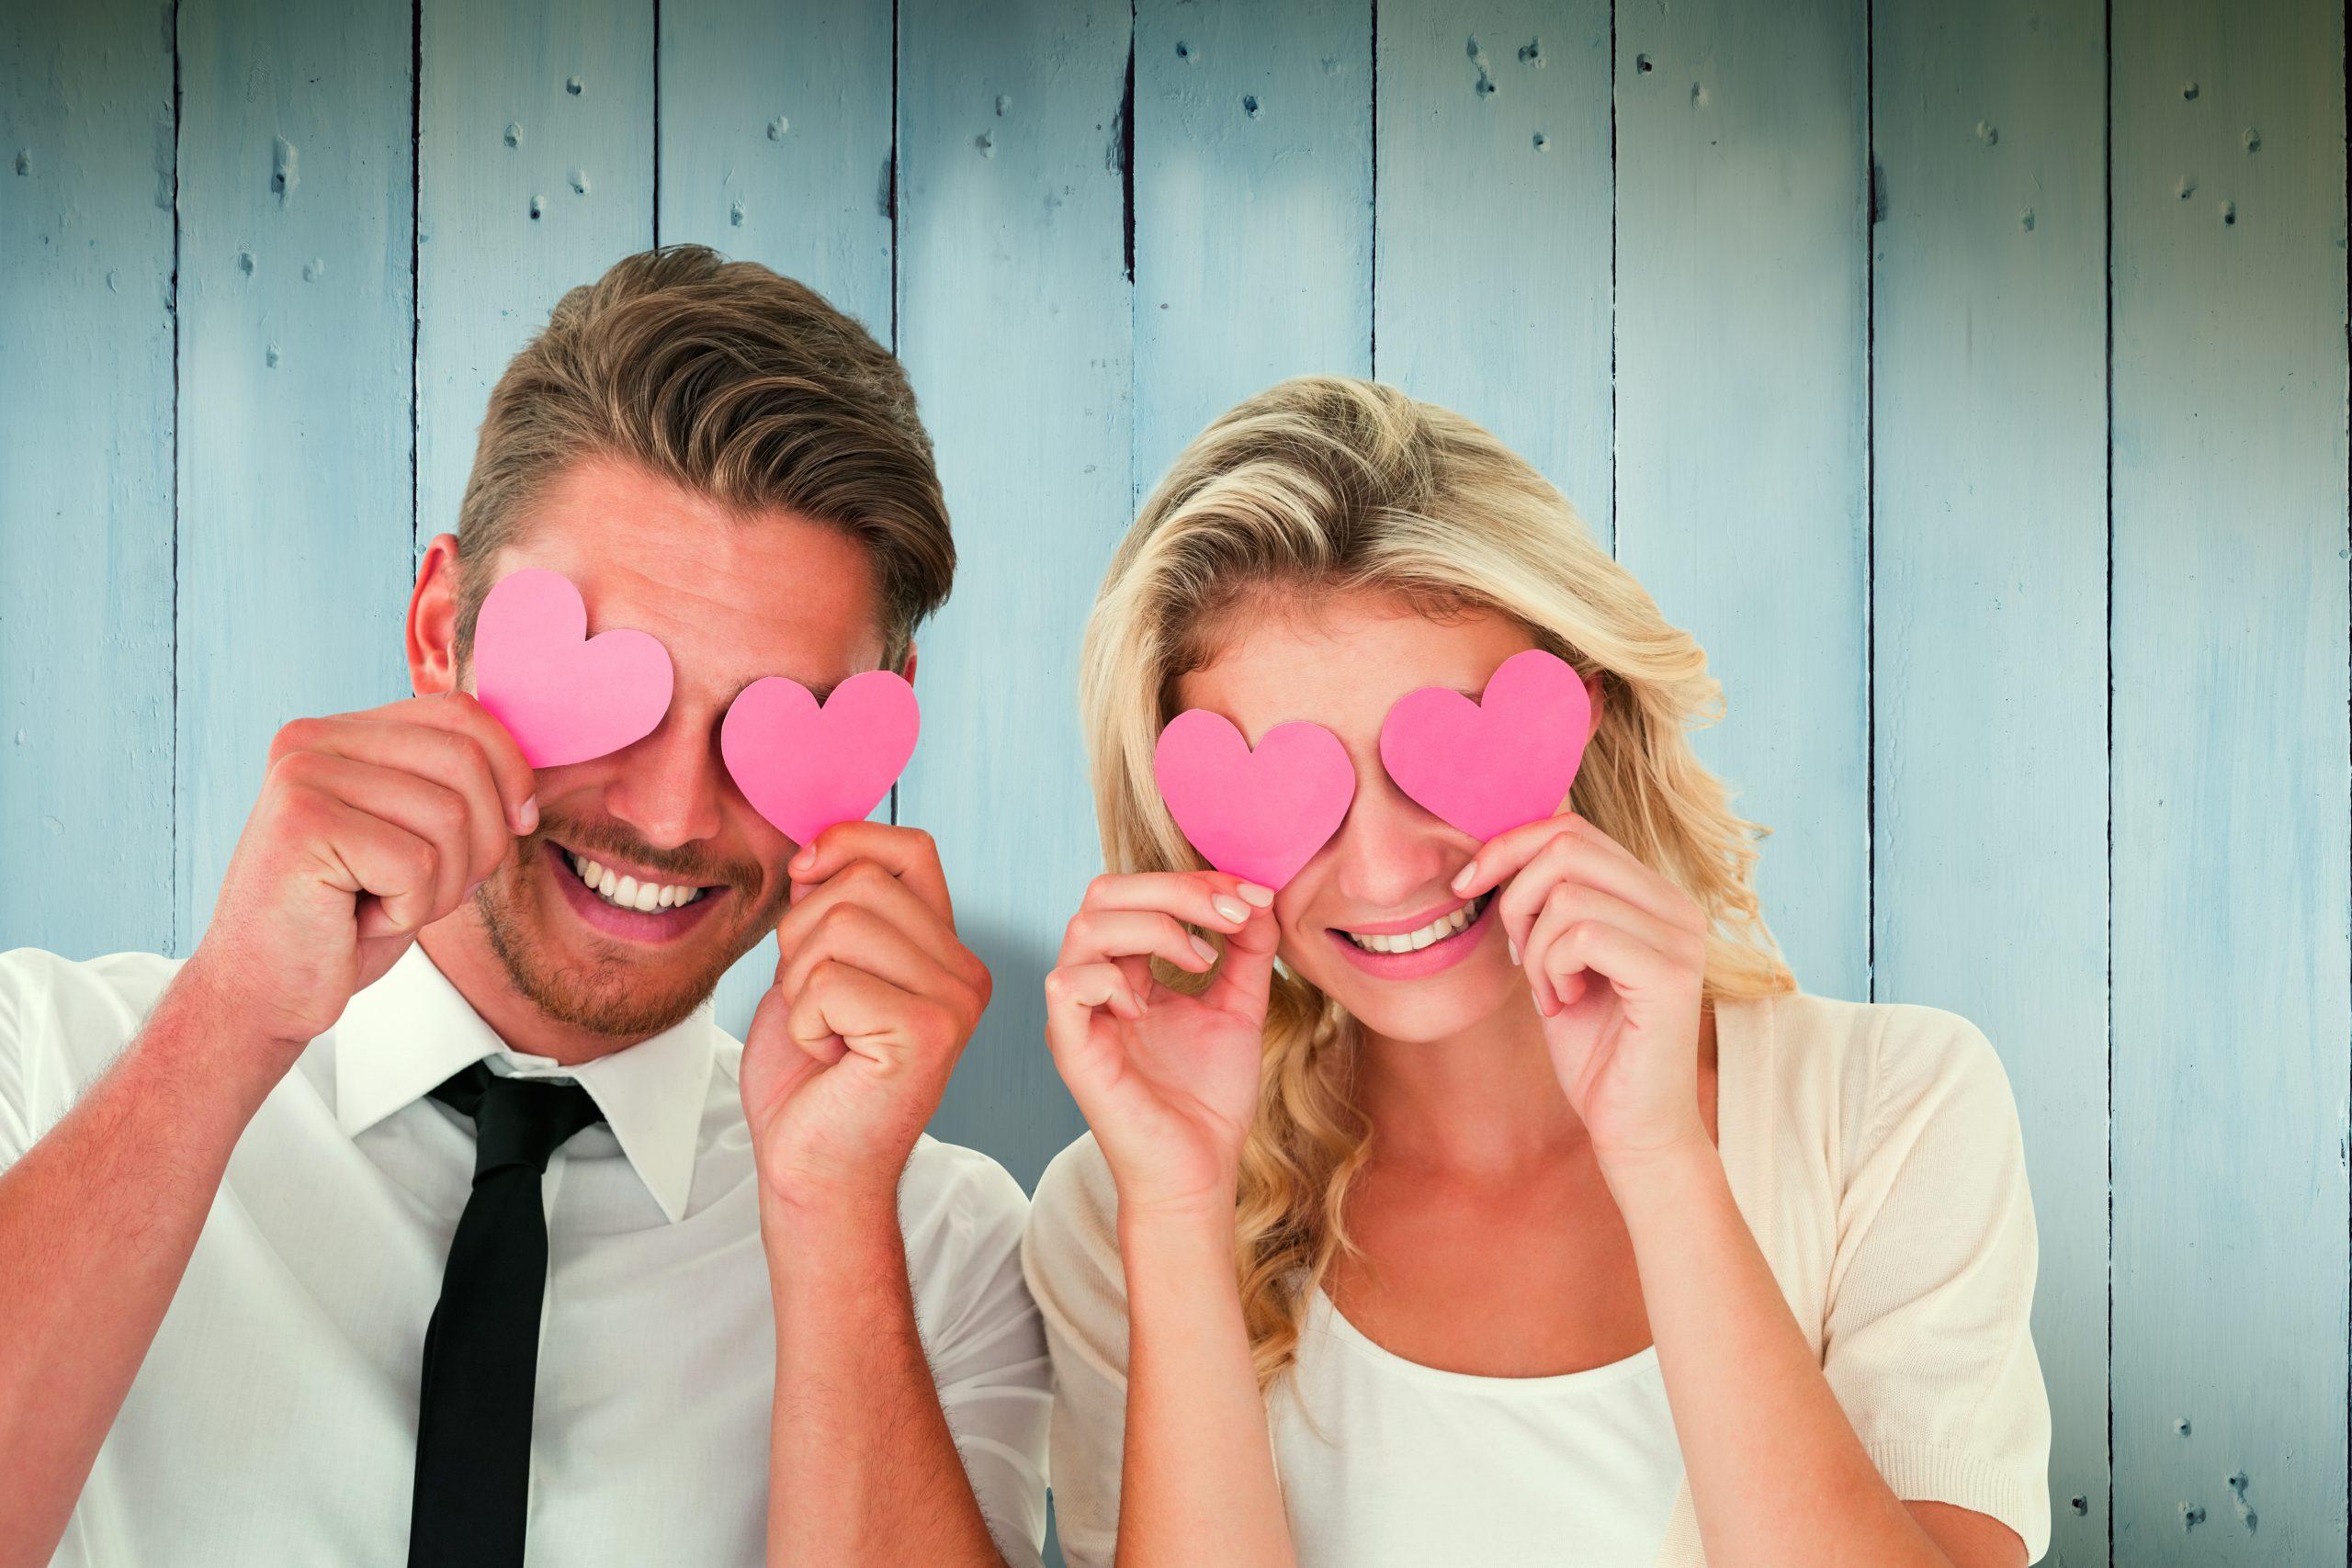 7 Love Myths We Still Keep Believing